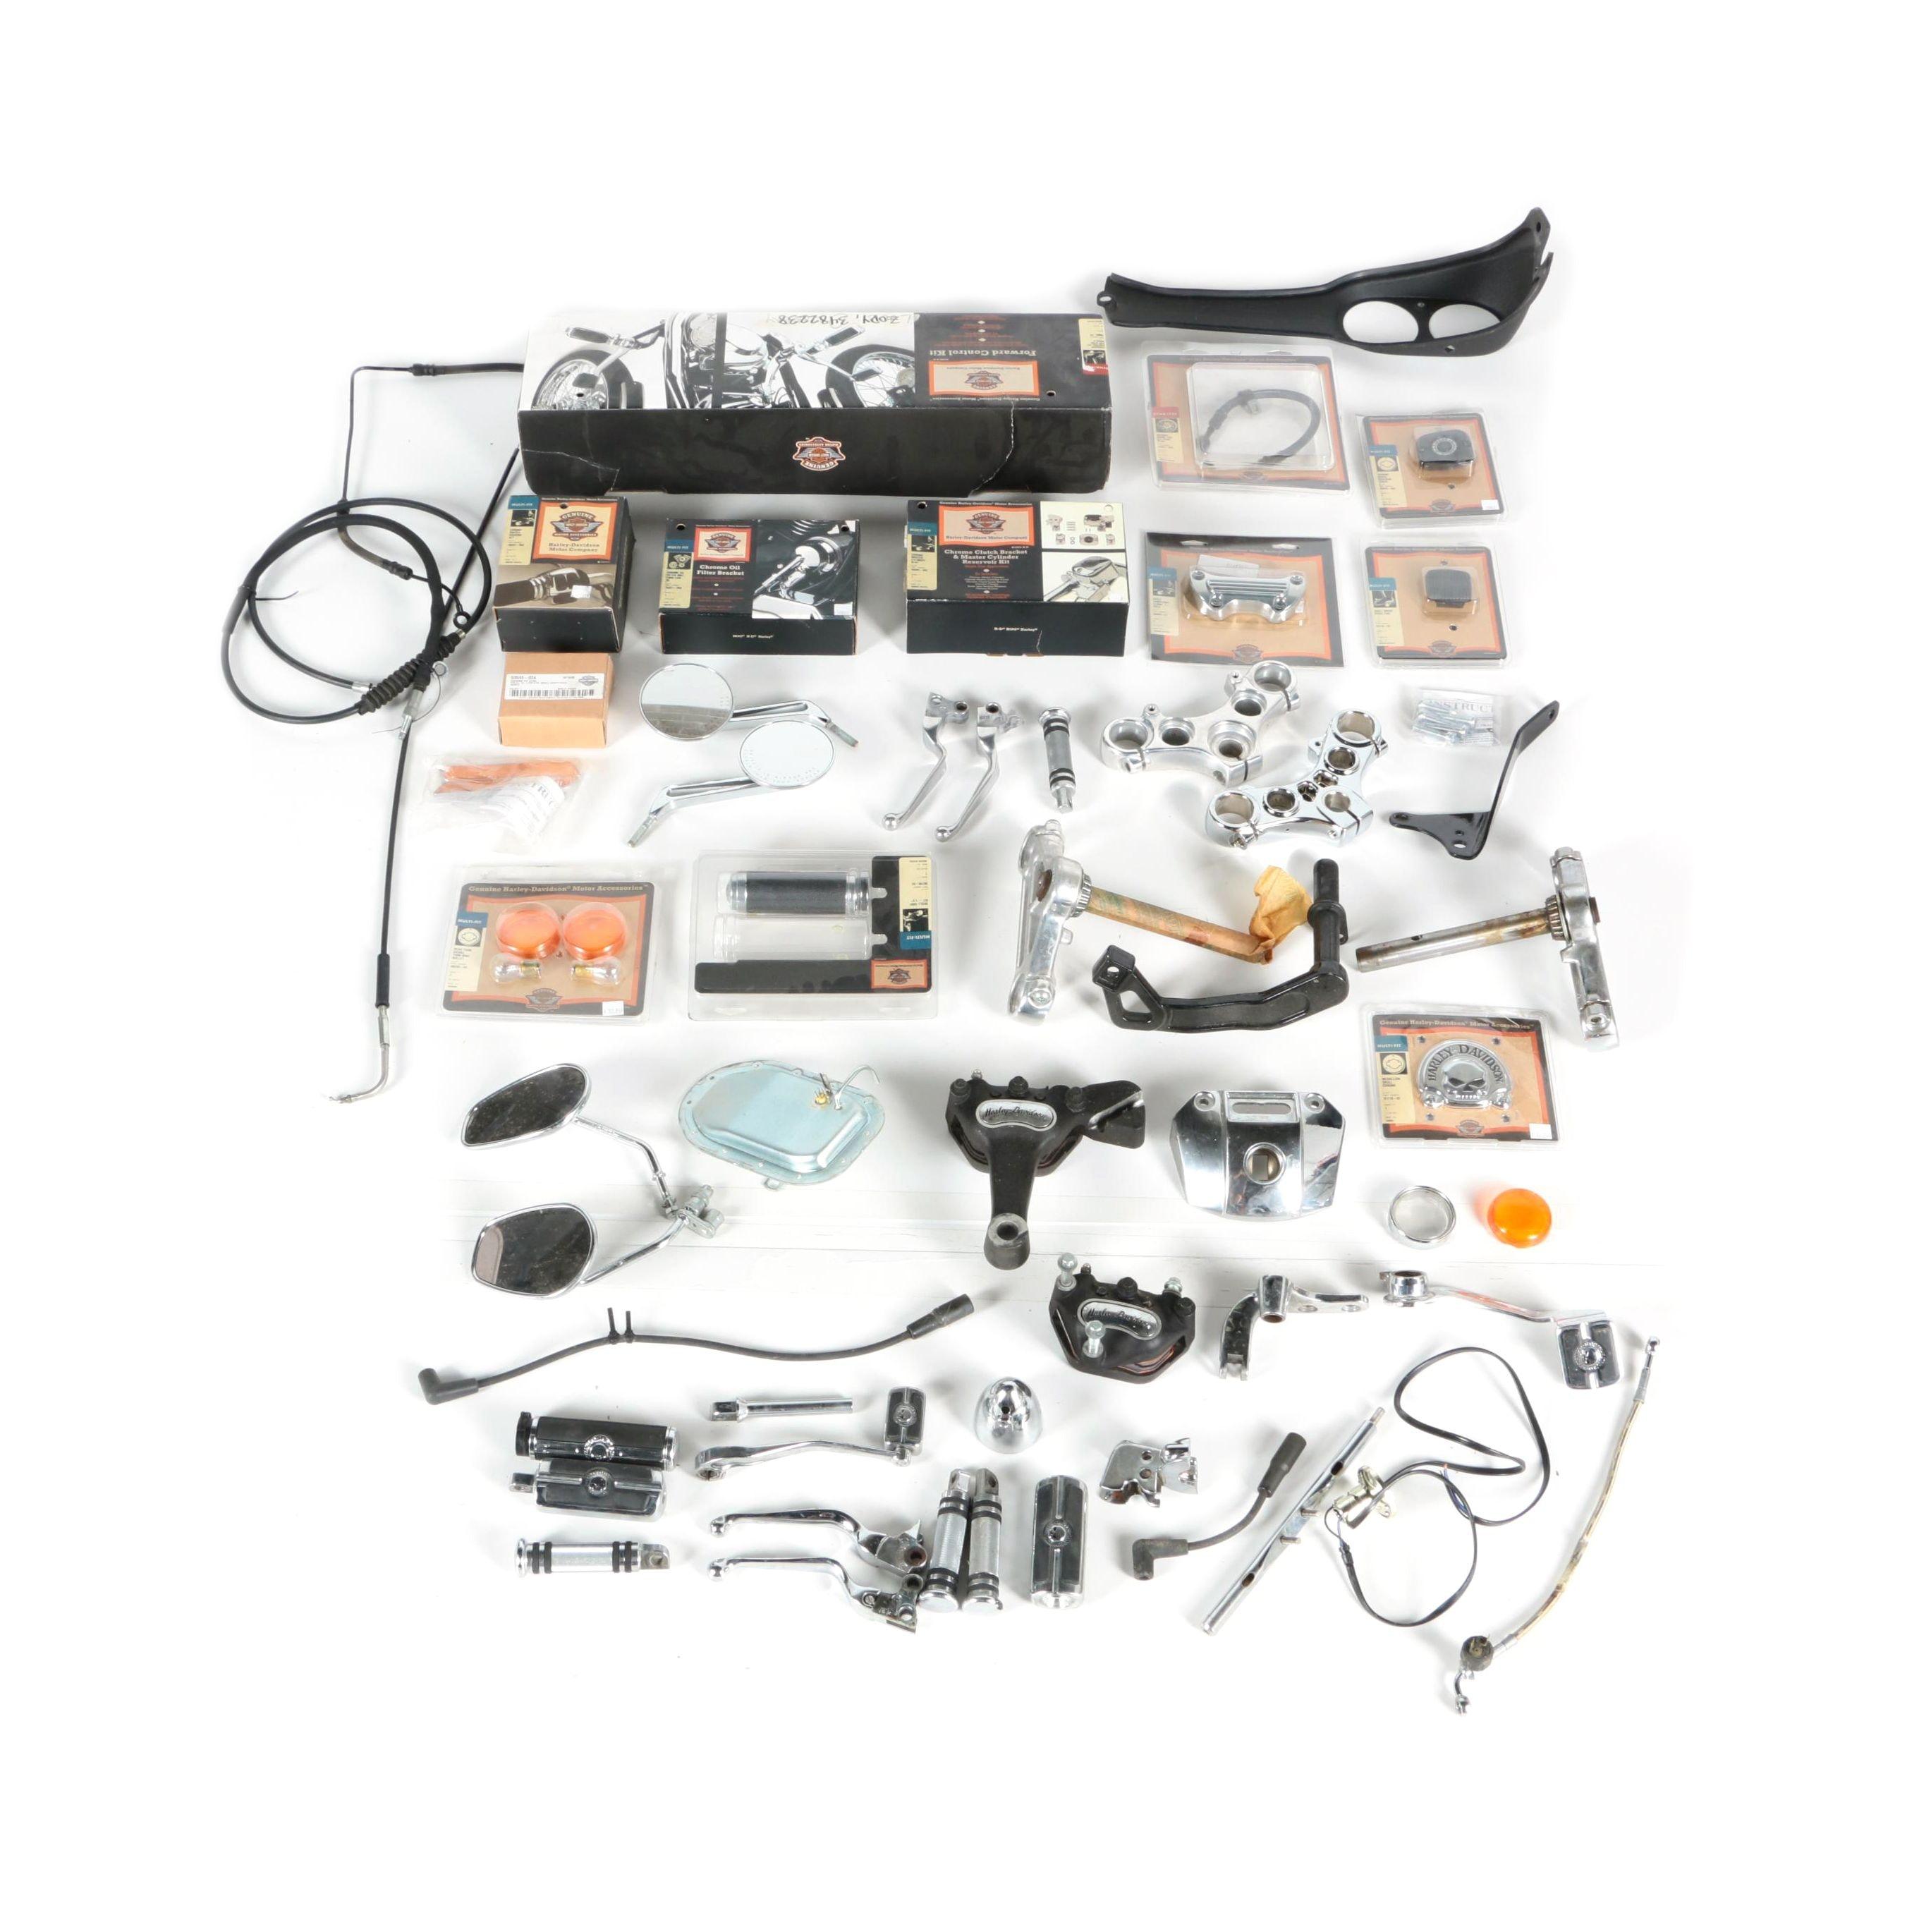 Assortment of Harley Davidson Parts